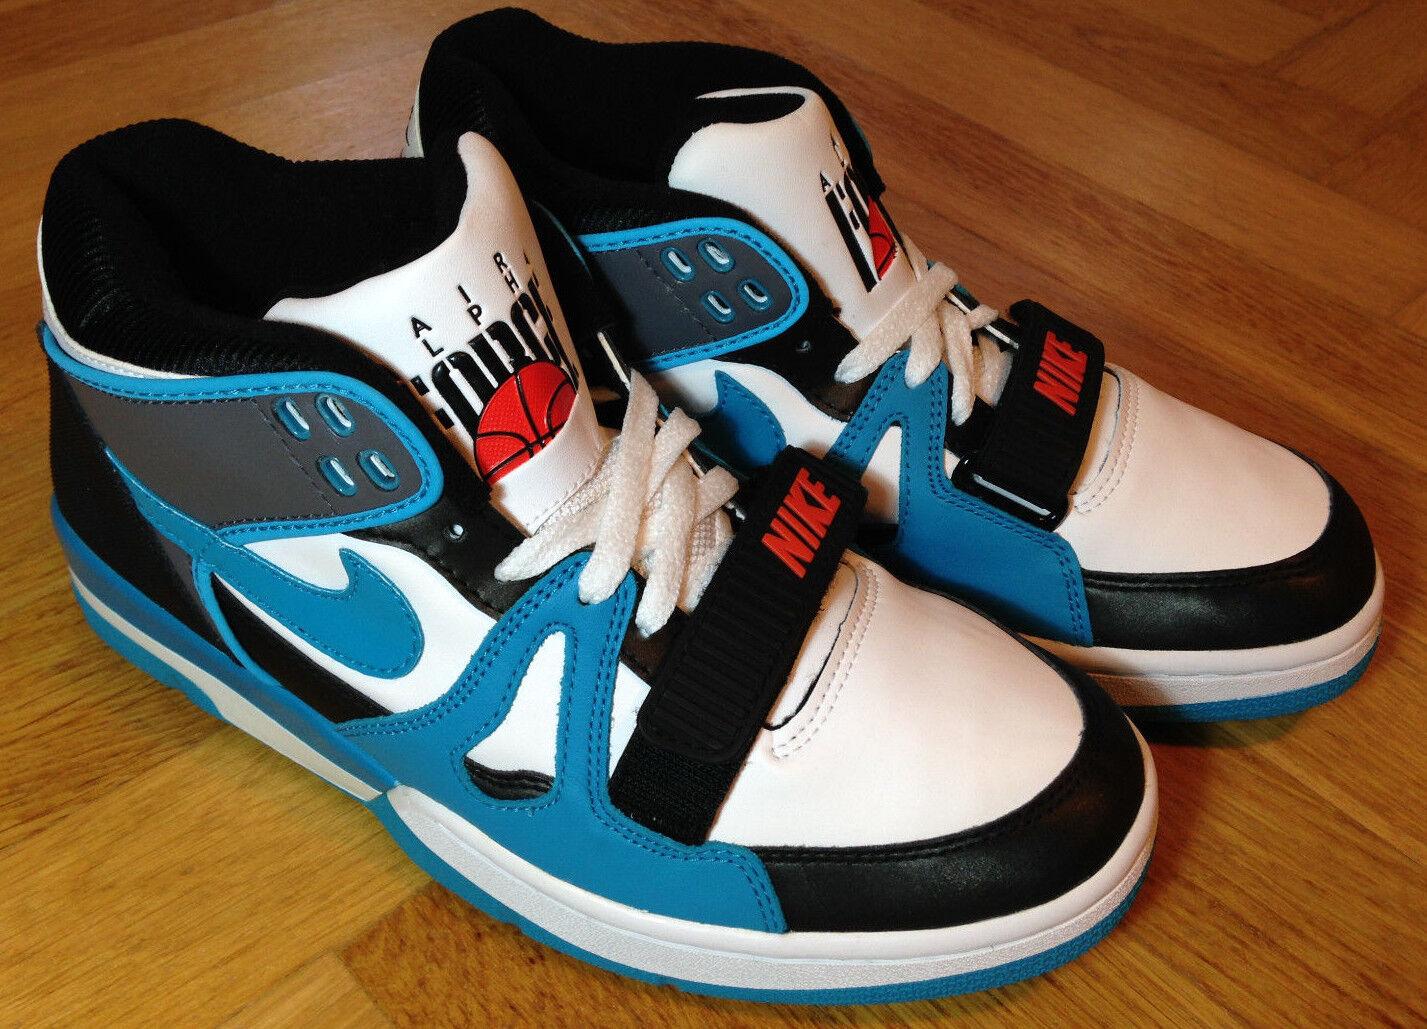 Nike Air Alpha Force II Mita white bluee Vintage US9 UK8 Eur 42,5 rar never worn